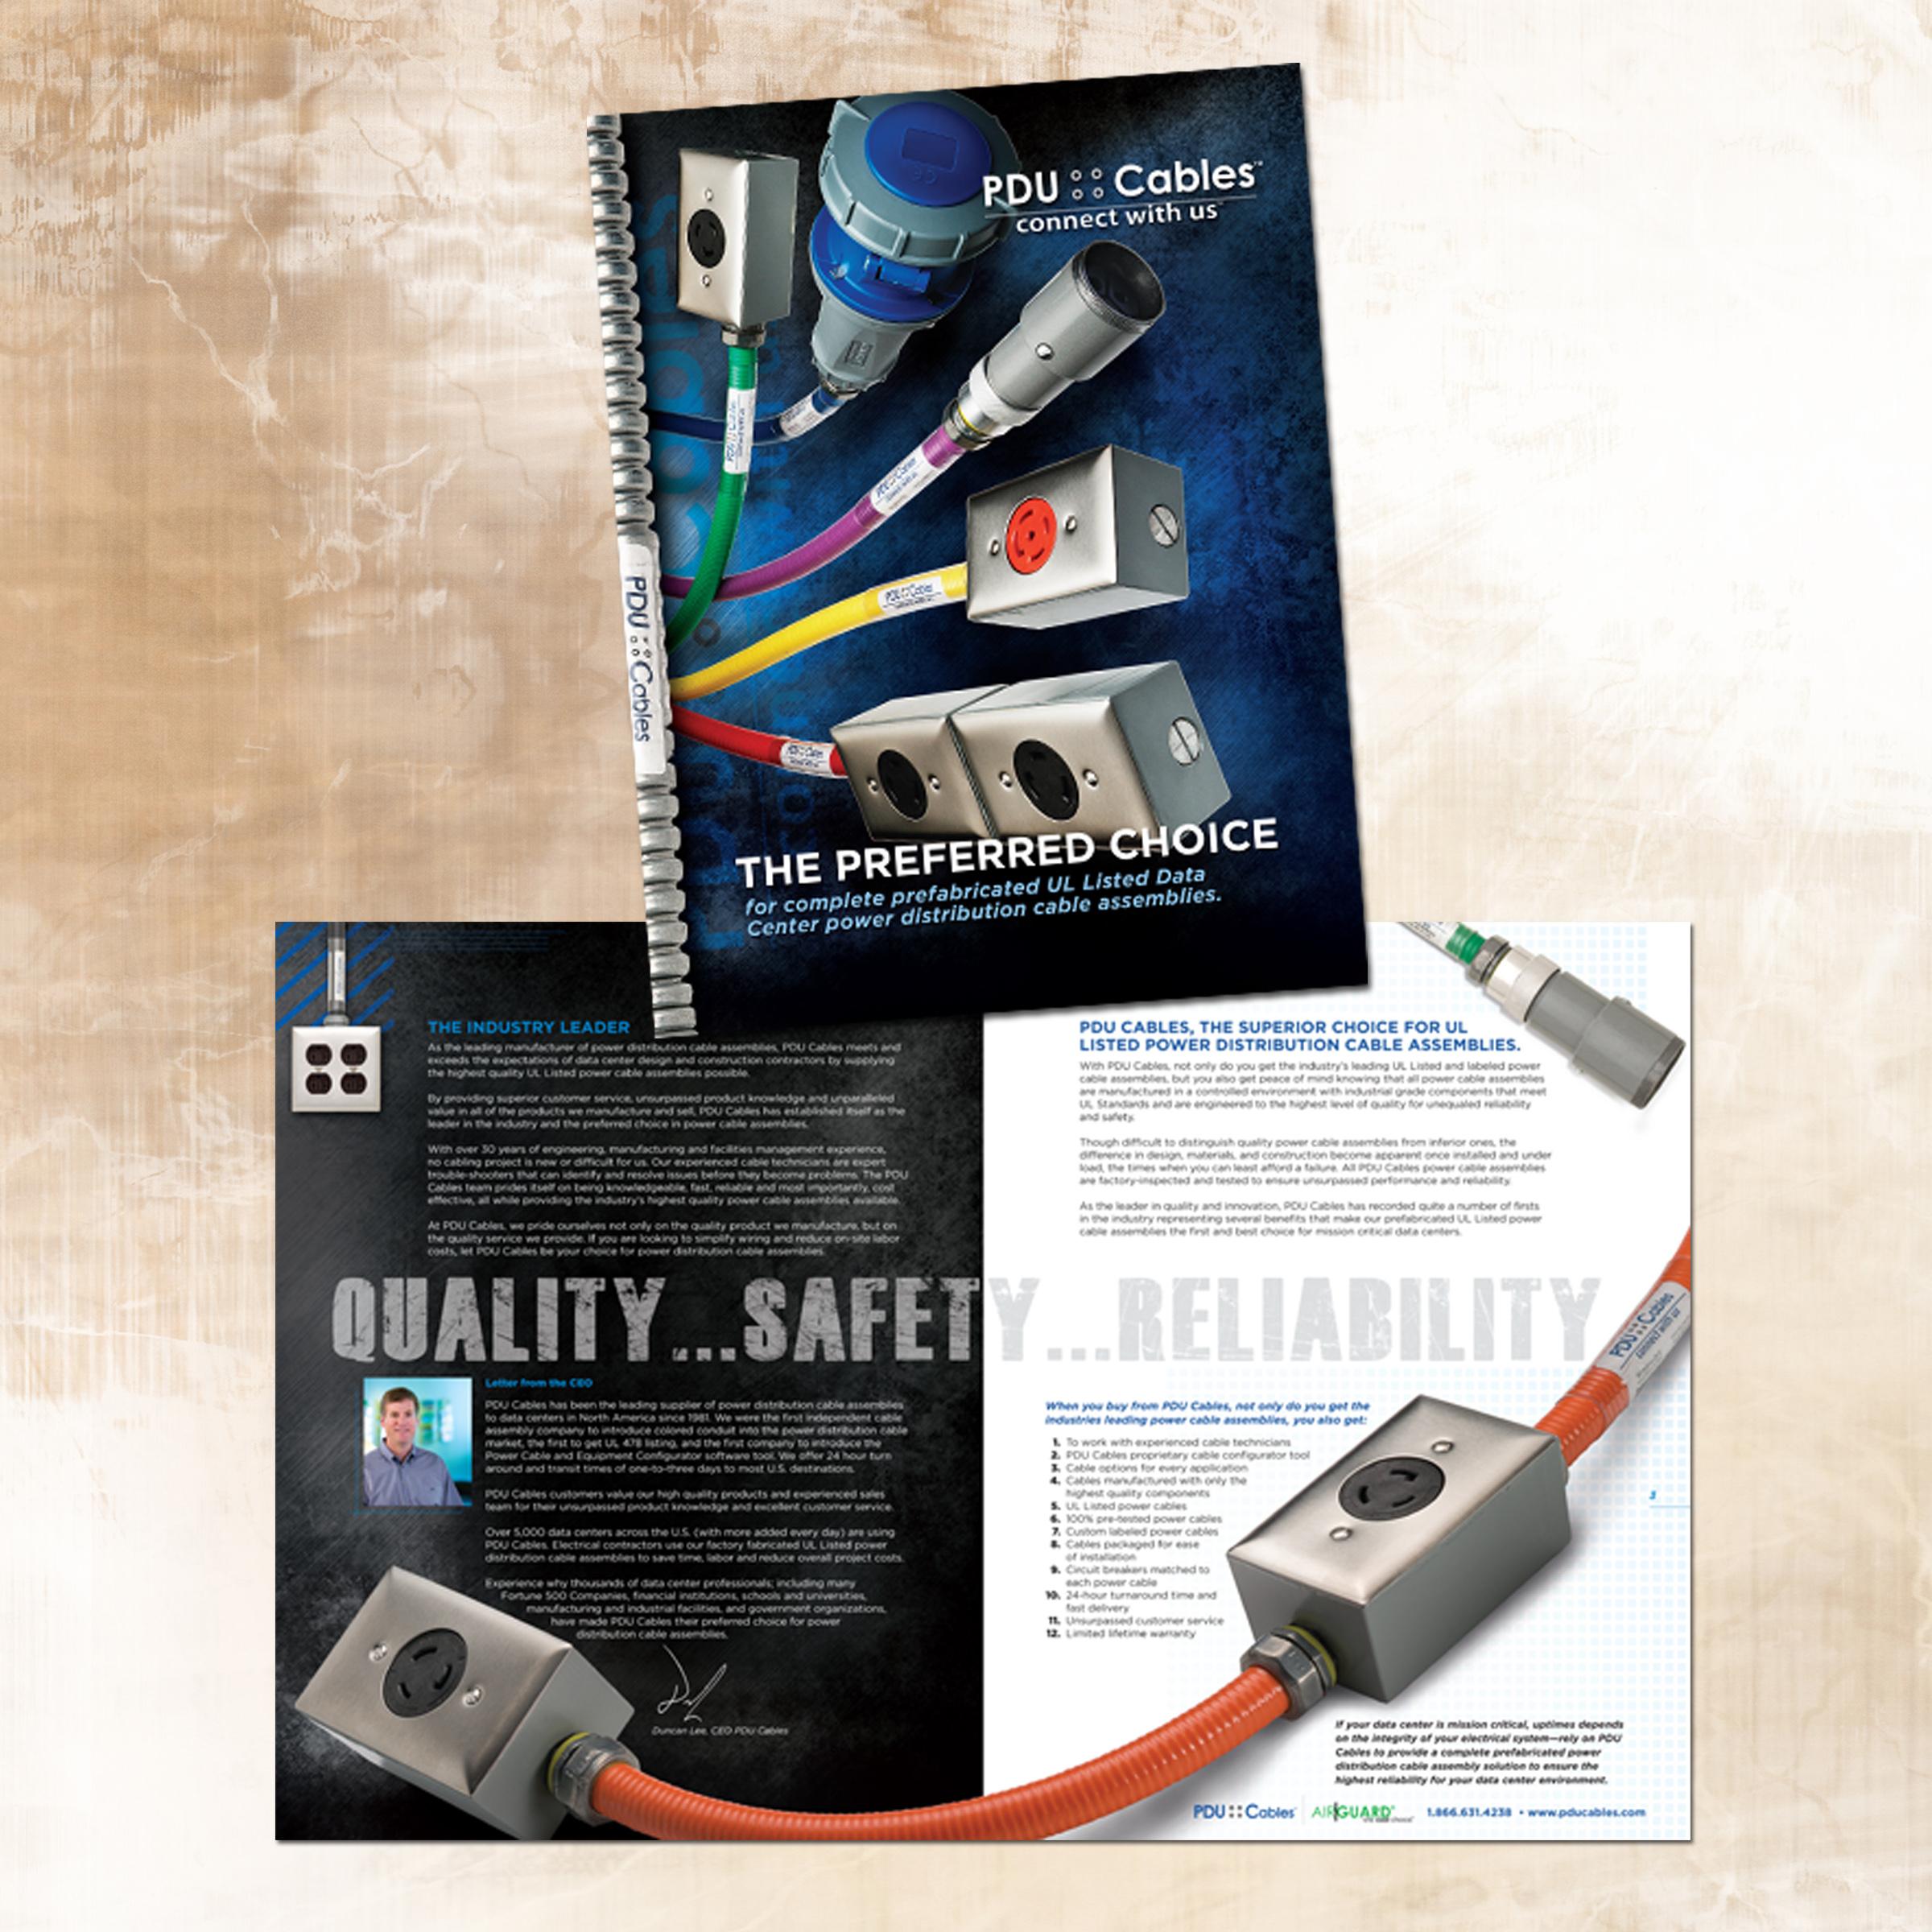 PDU Cables & Air-Guard